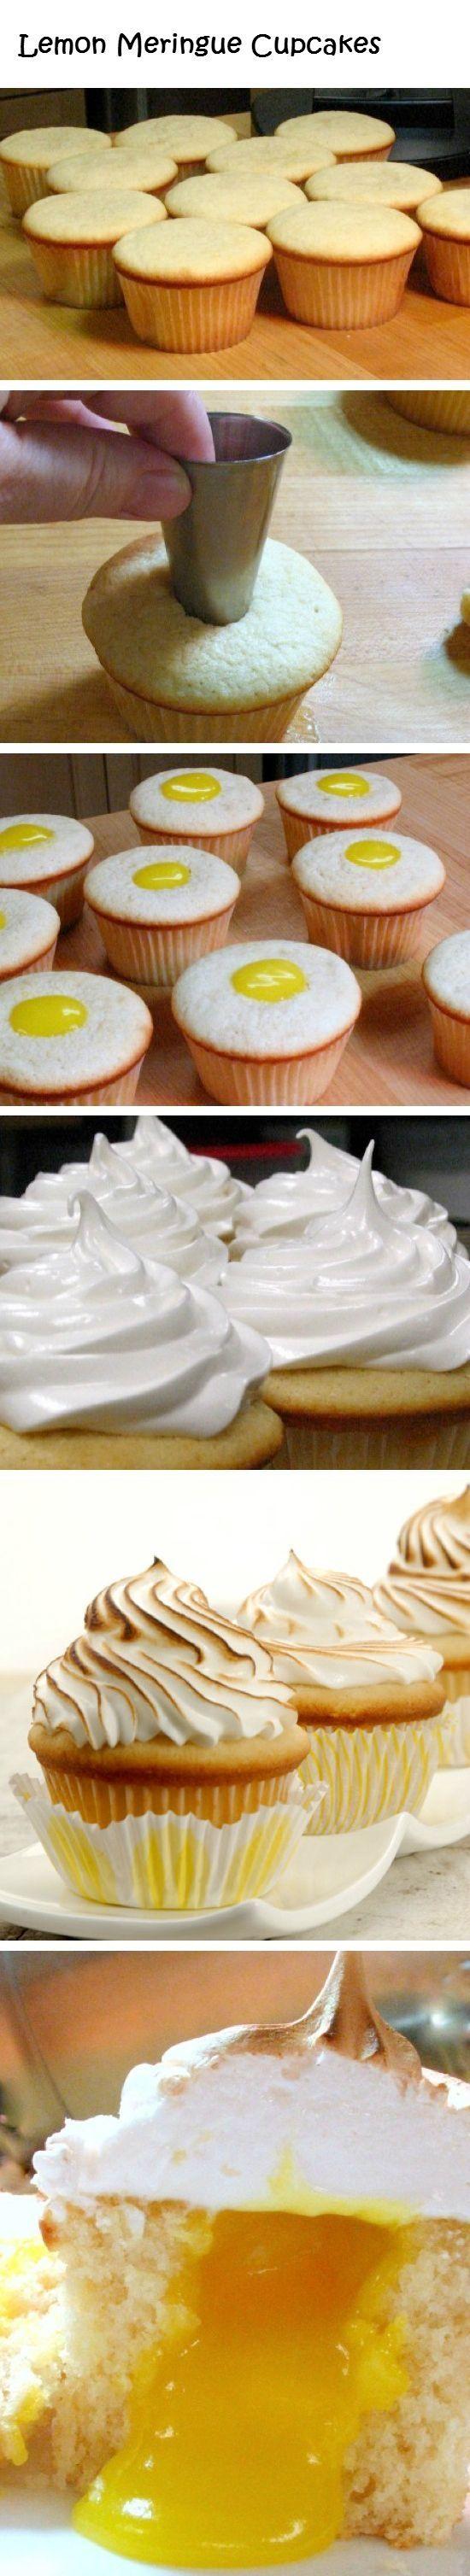 20 Cupcake Ideas!